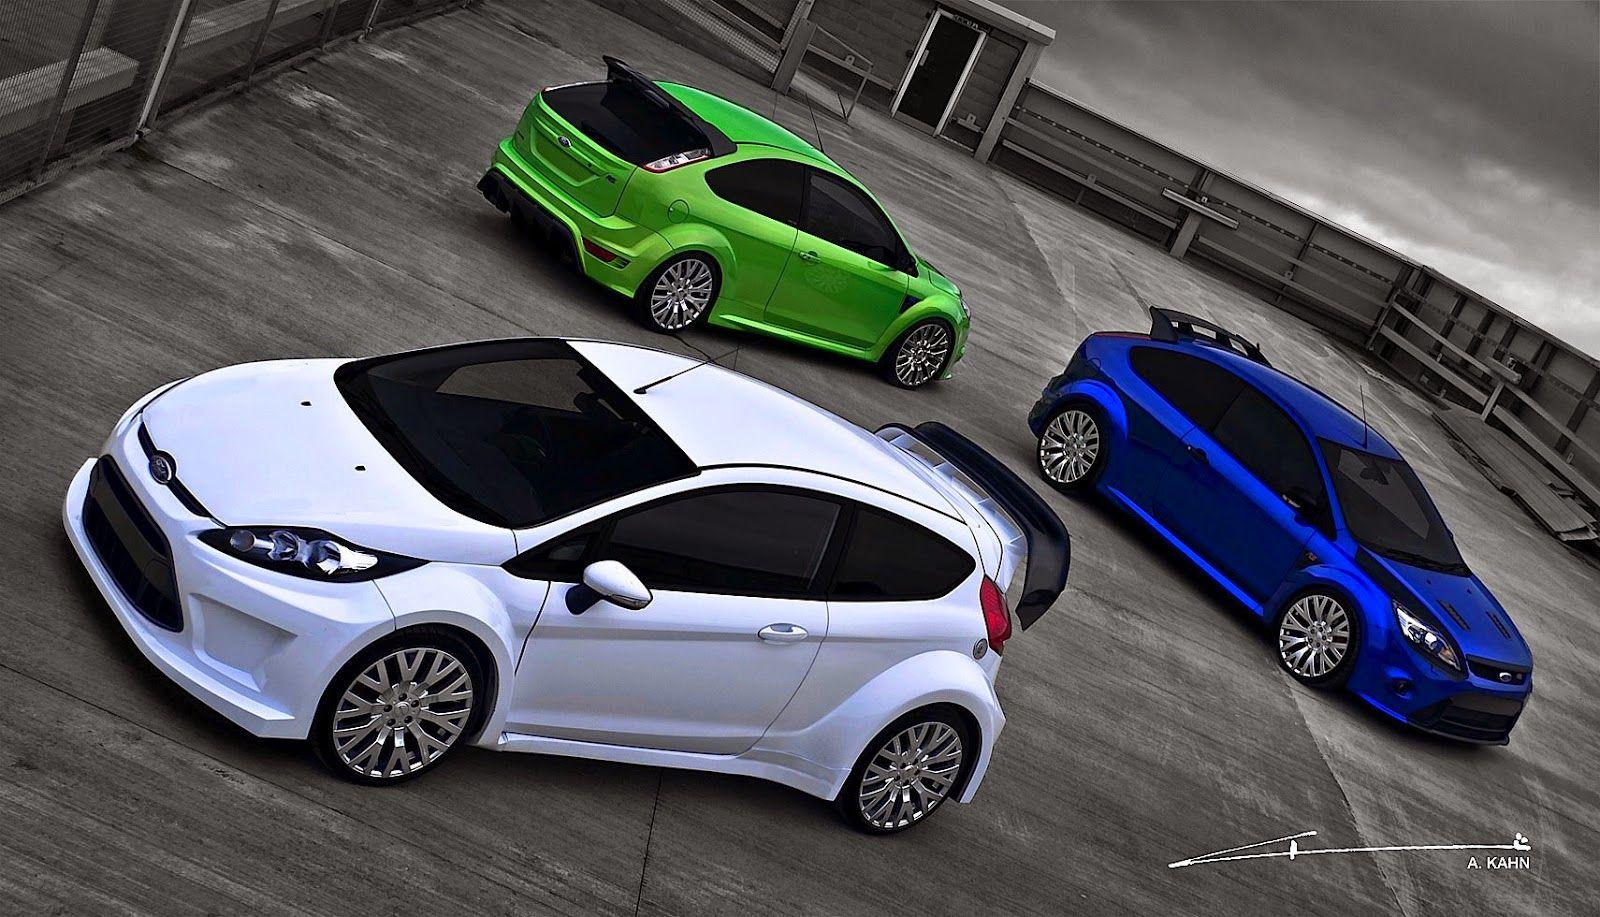 2015 Ford Fiesta Ford Fiesta St Ford Focus Rs Ford Focus